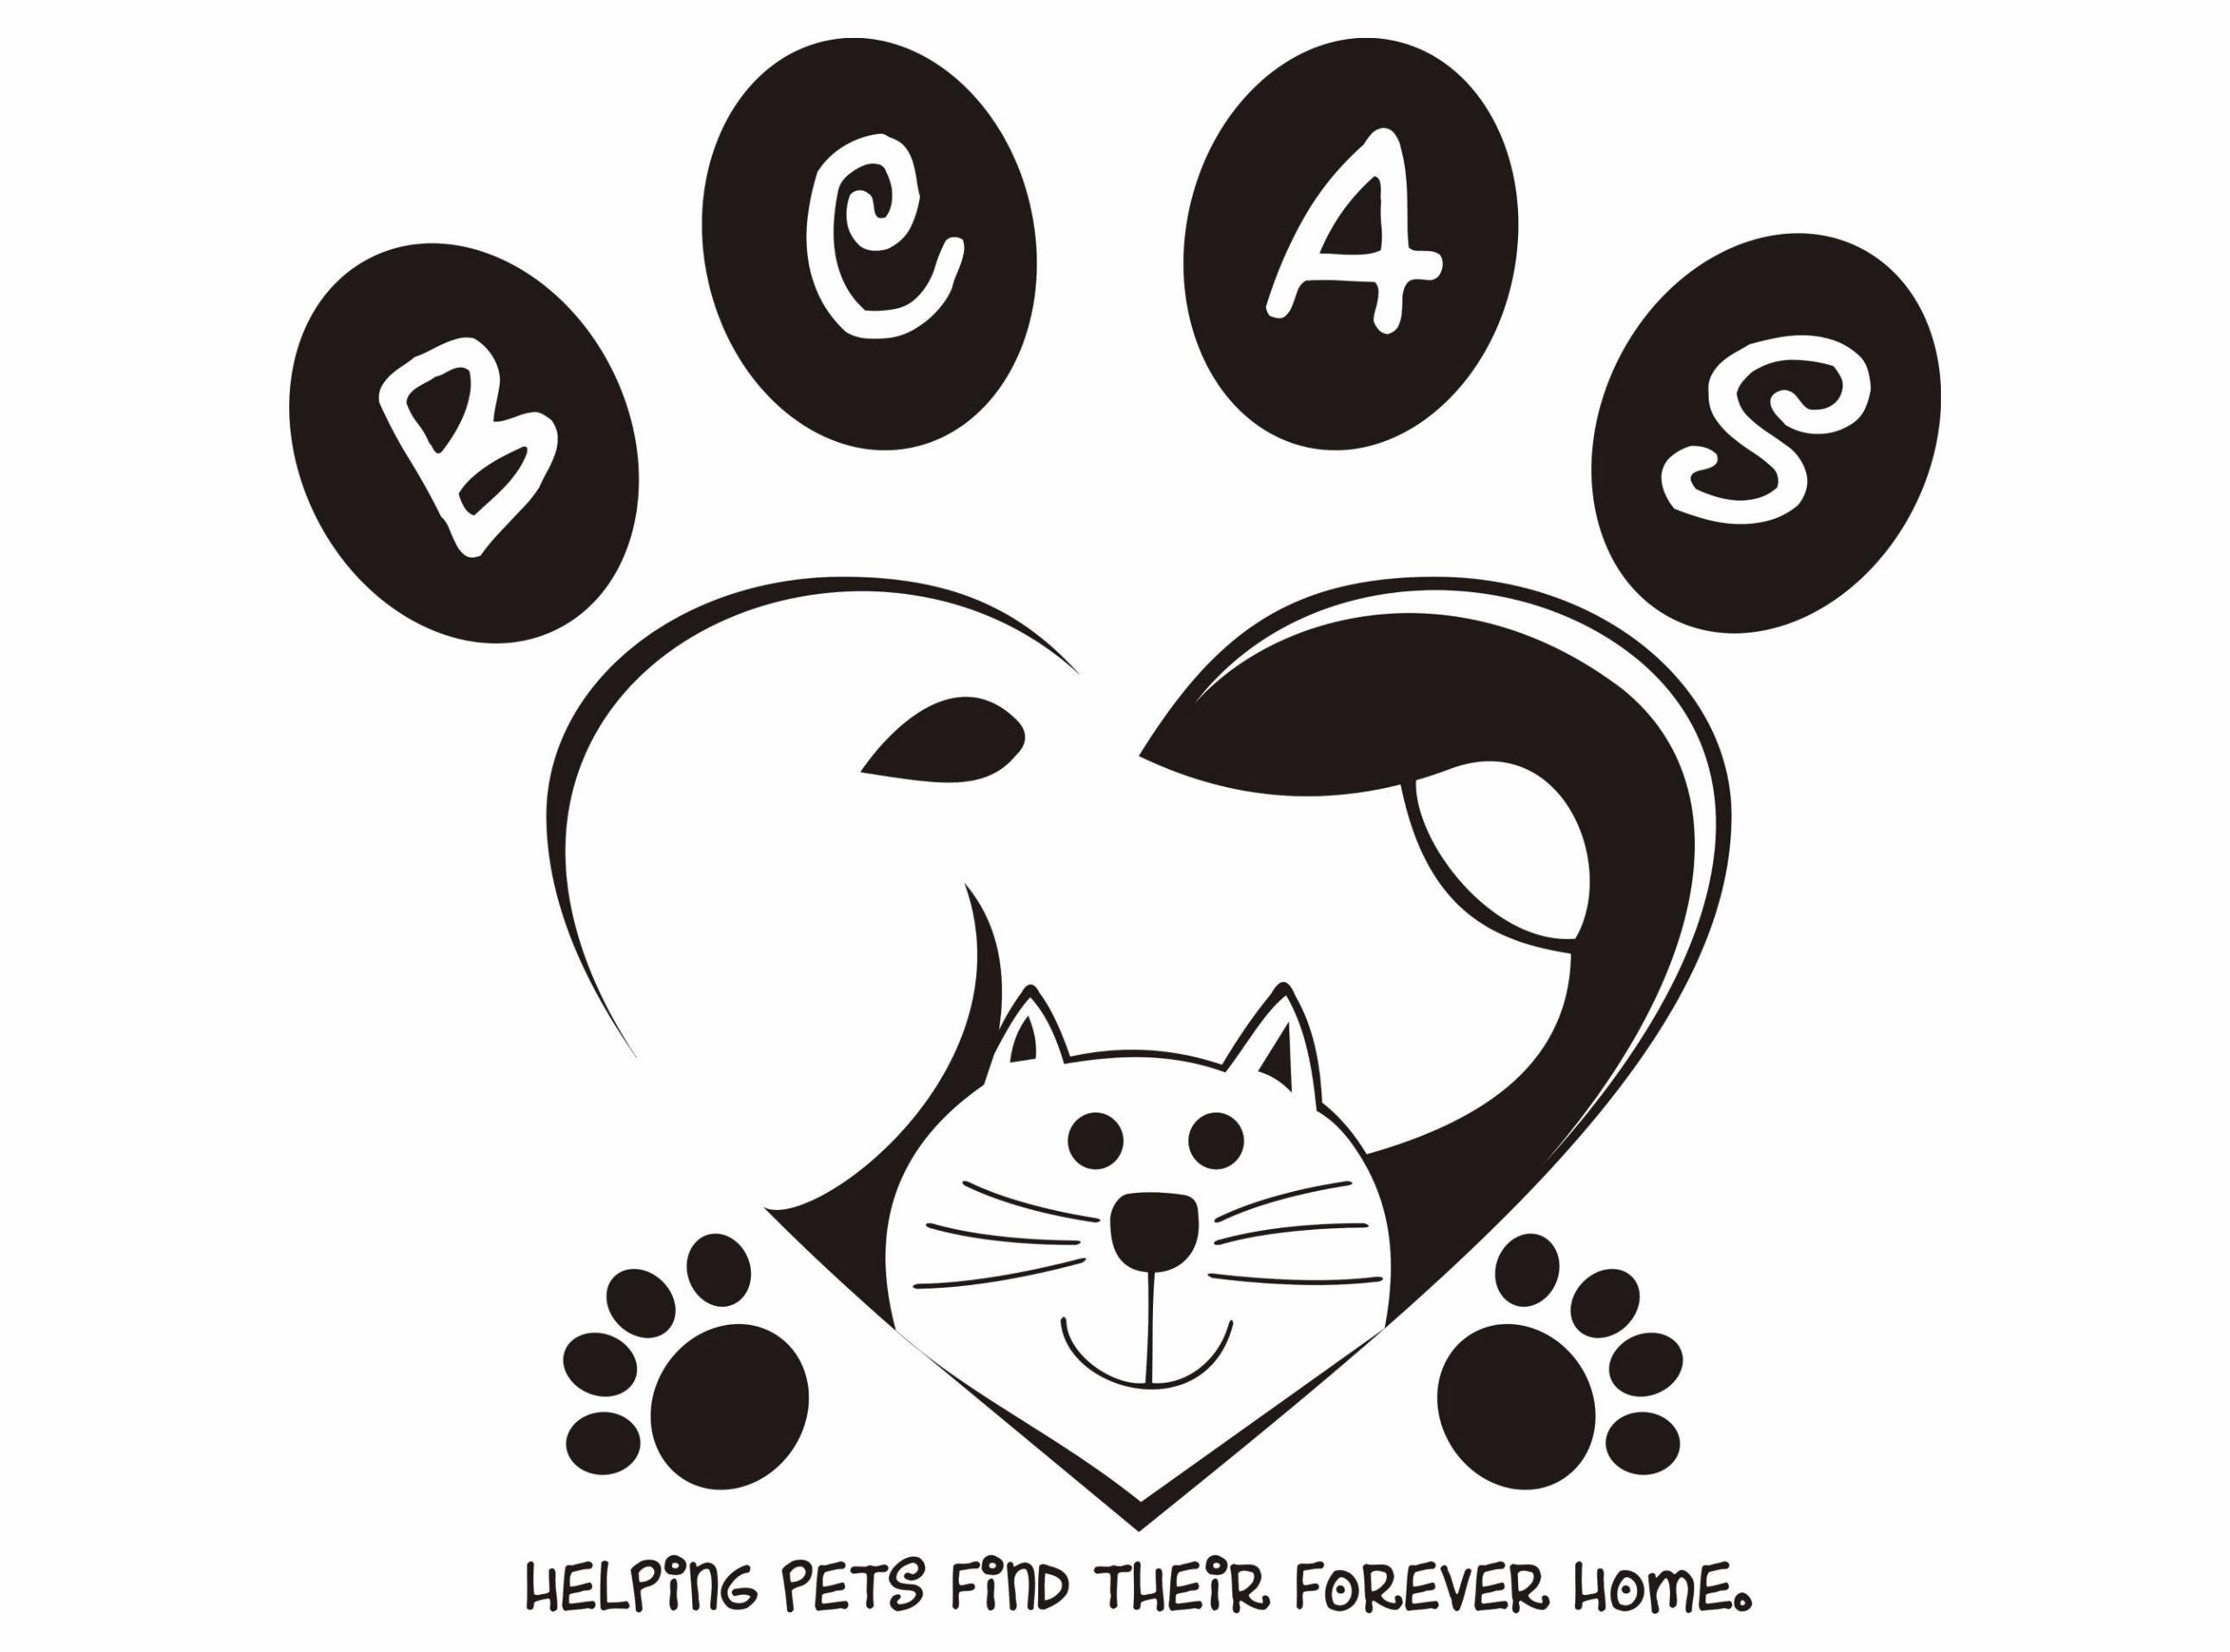 Buchanan County Animal Shelter